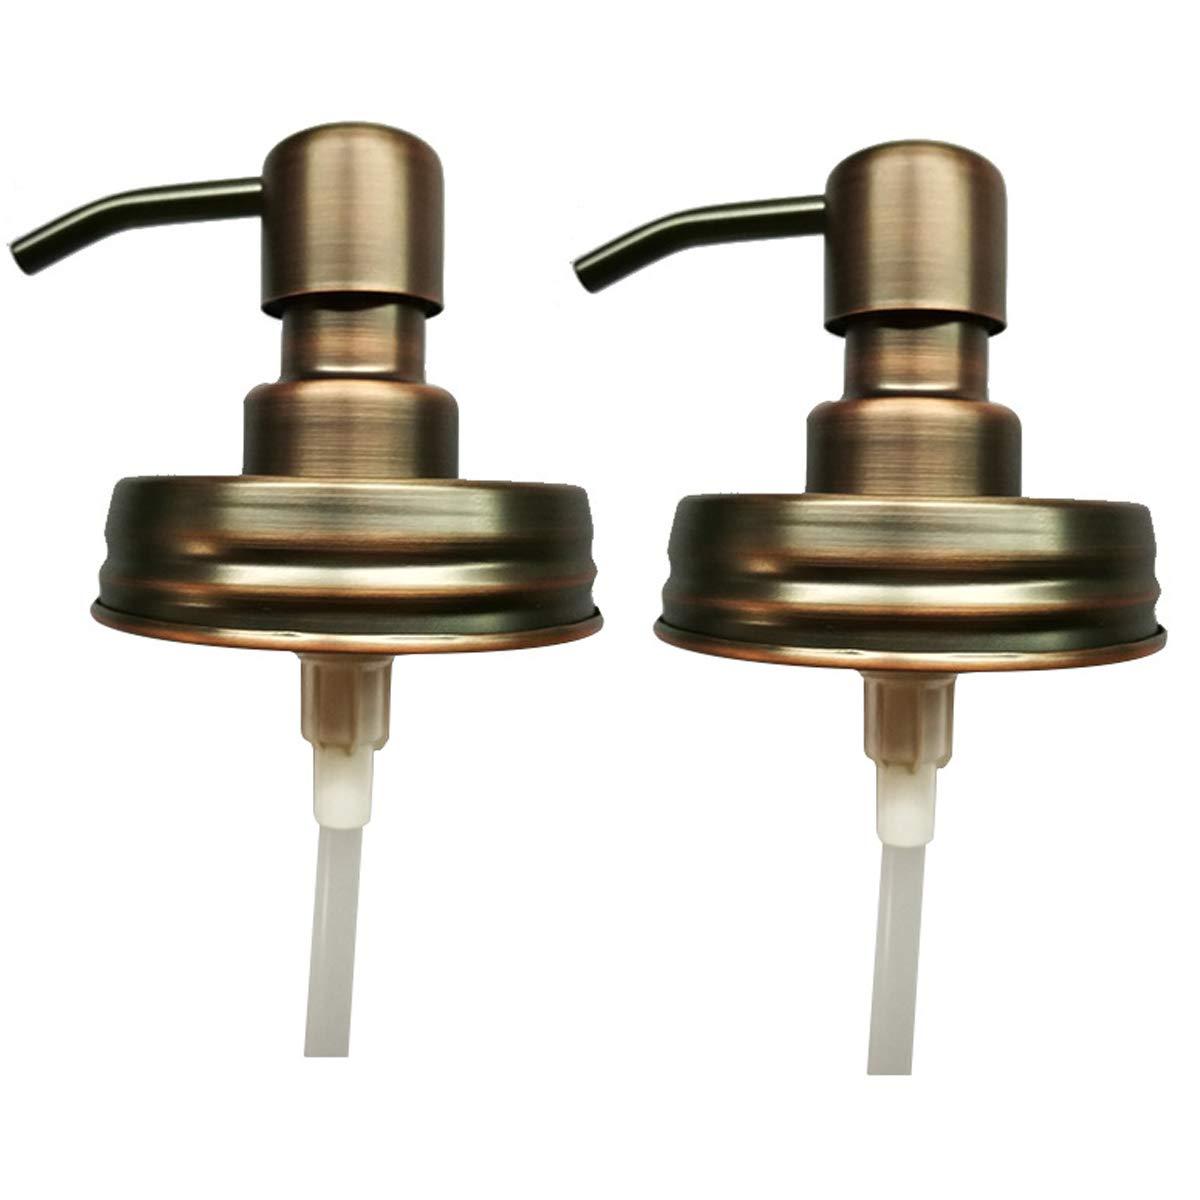 2 Pcs Mason Jar Soap Dispenser - Stainless Steel Rust Proof Rustic Farmhouse Soap Lotion Pumps for Mason Jar(Copper,Jar Not Included)